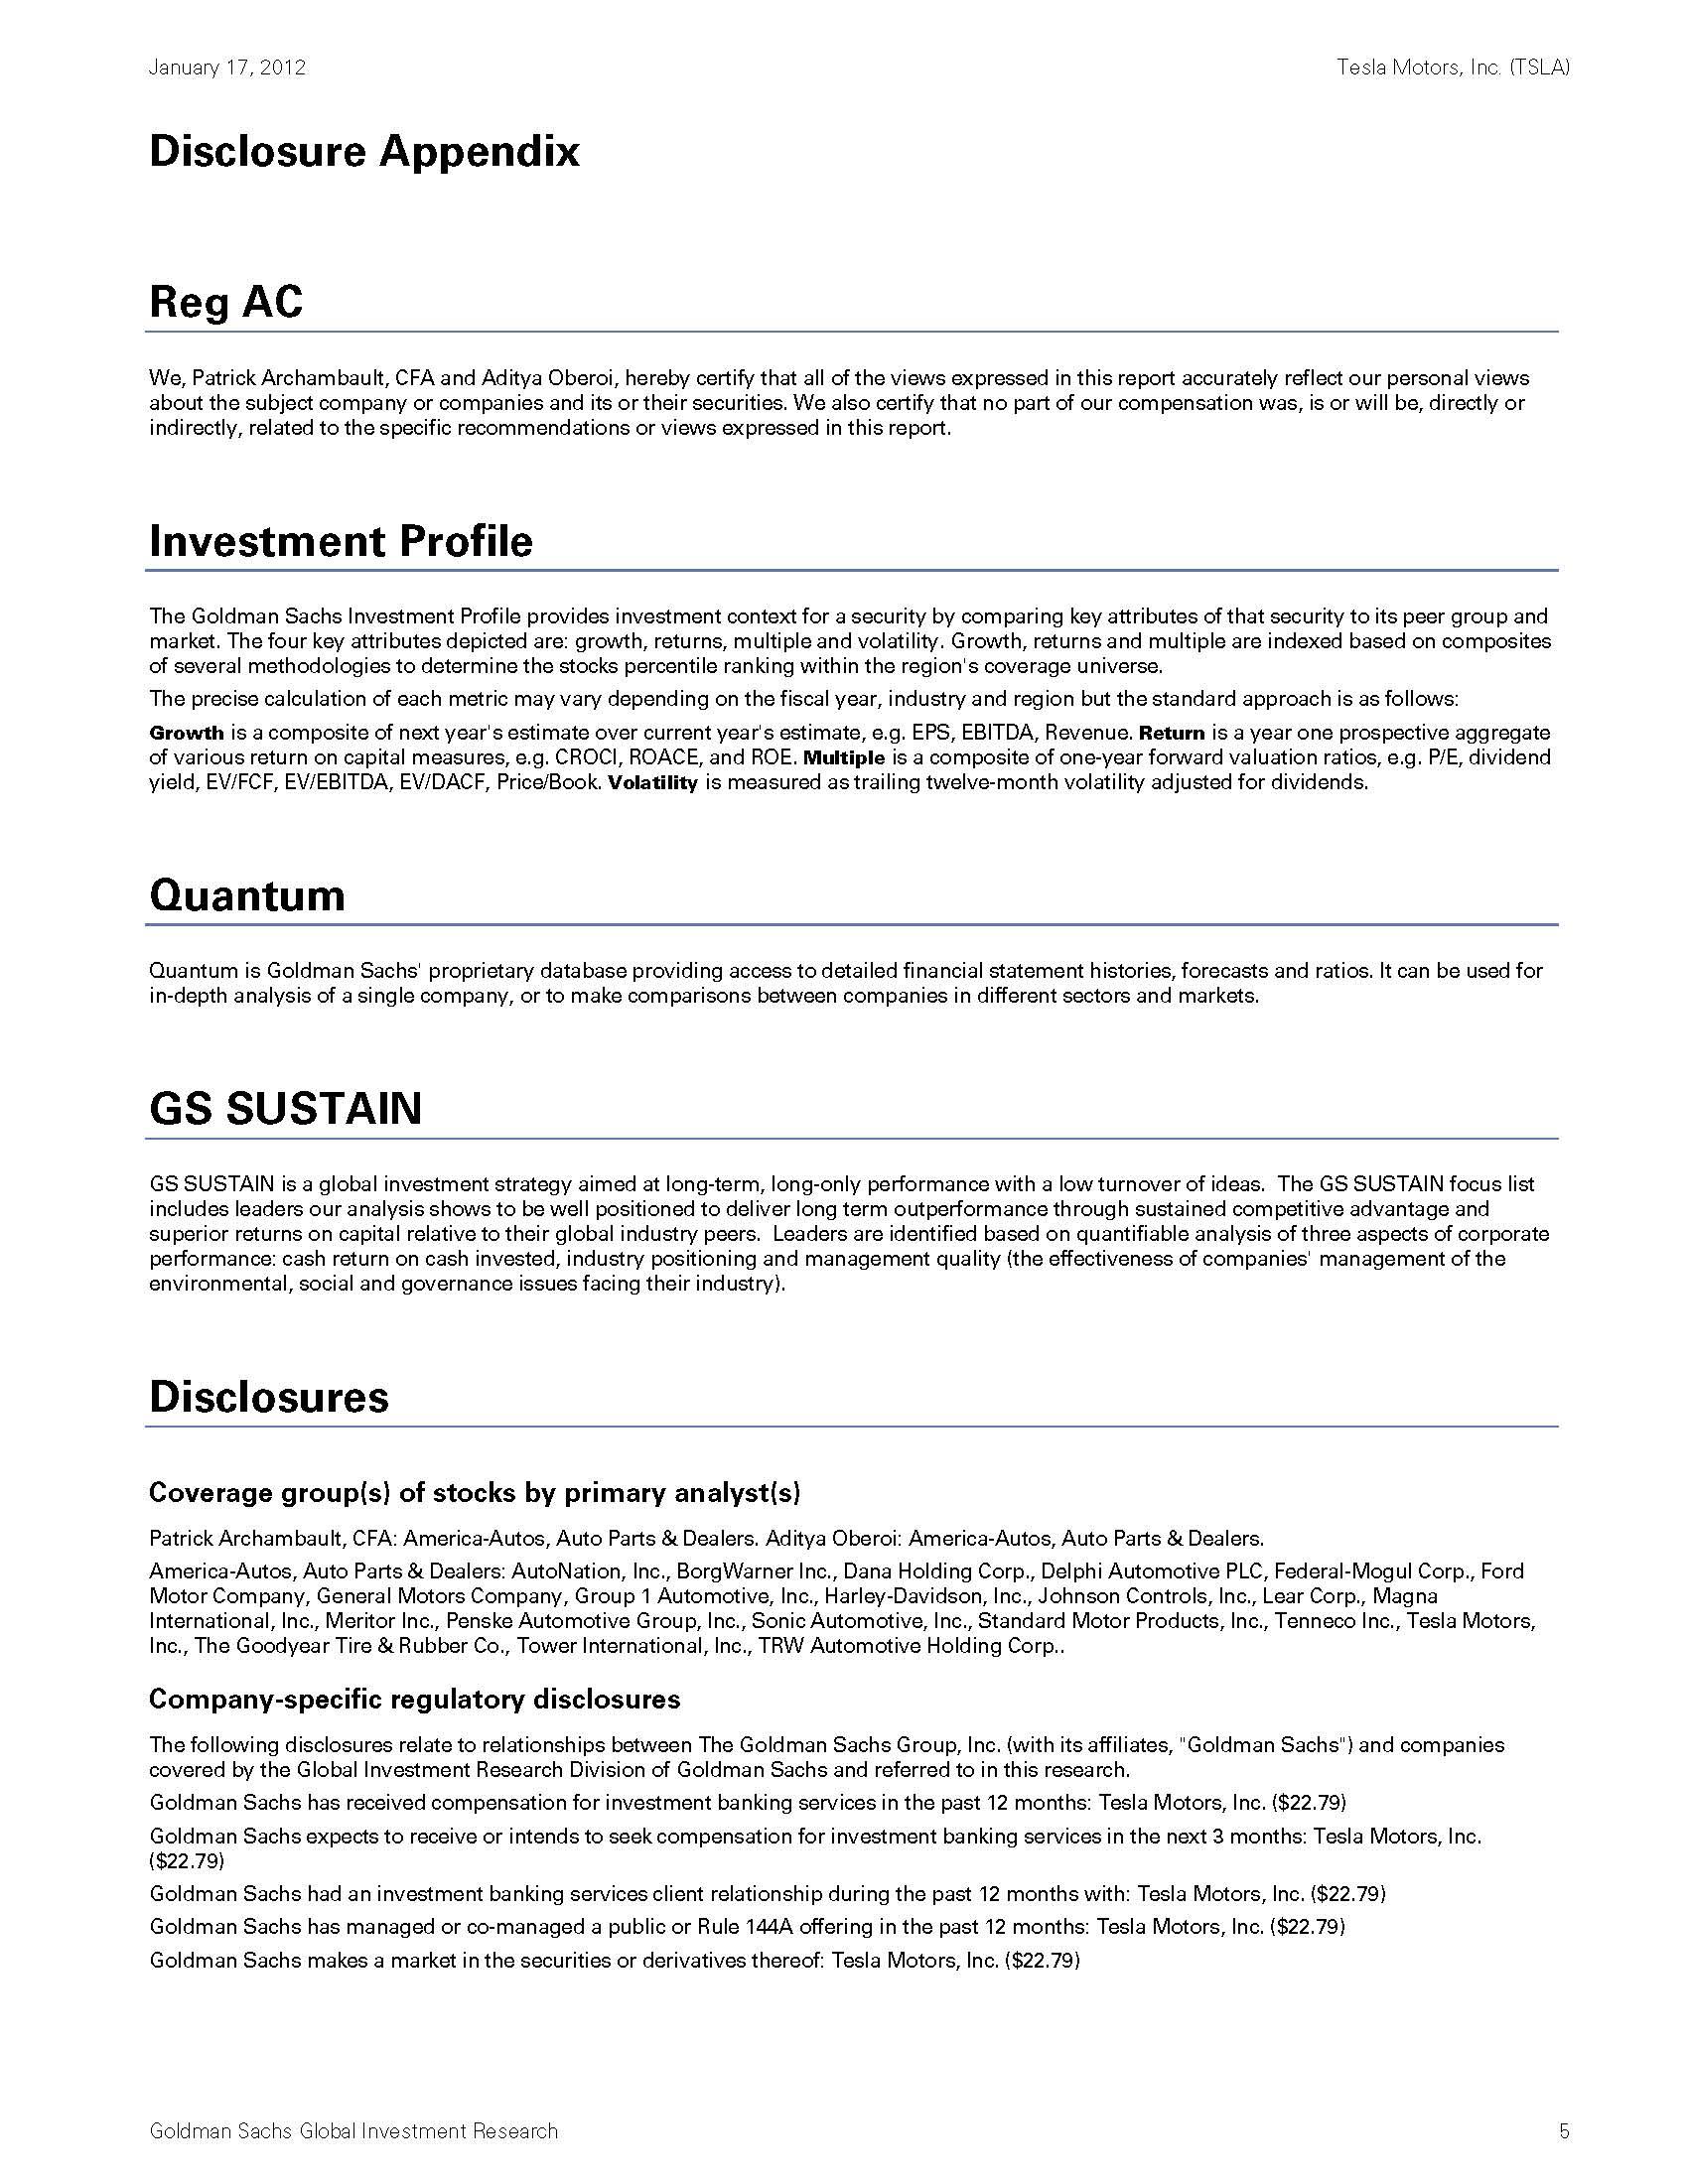 tesla_goldman_Page_5.jpg